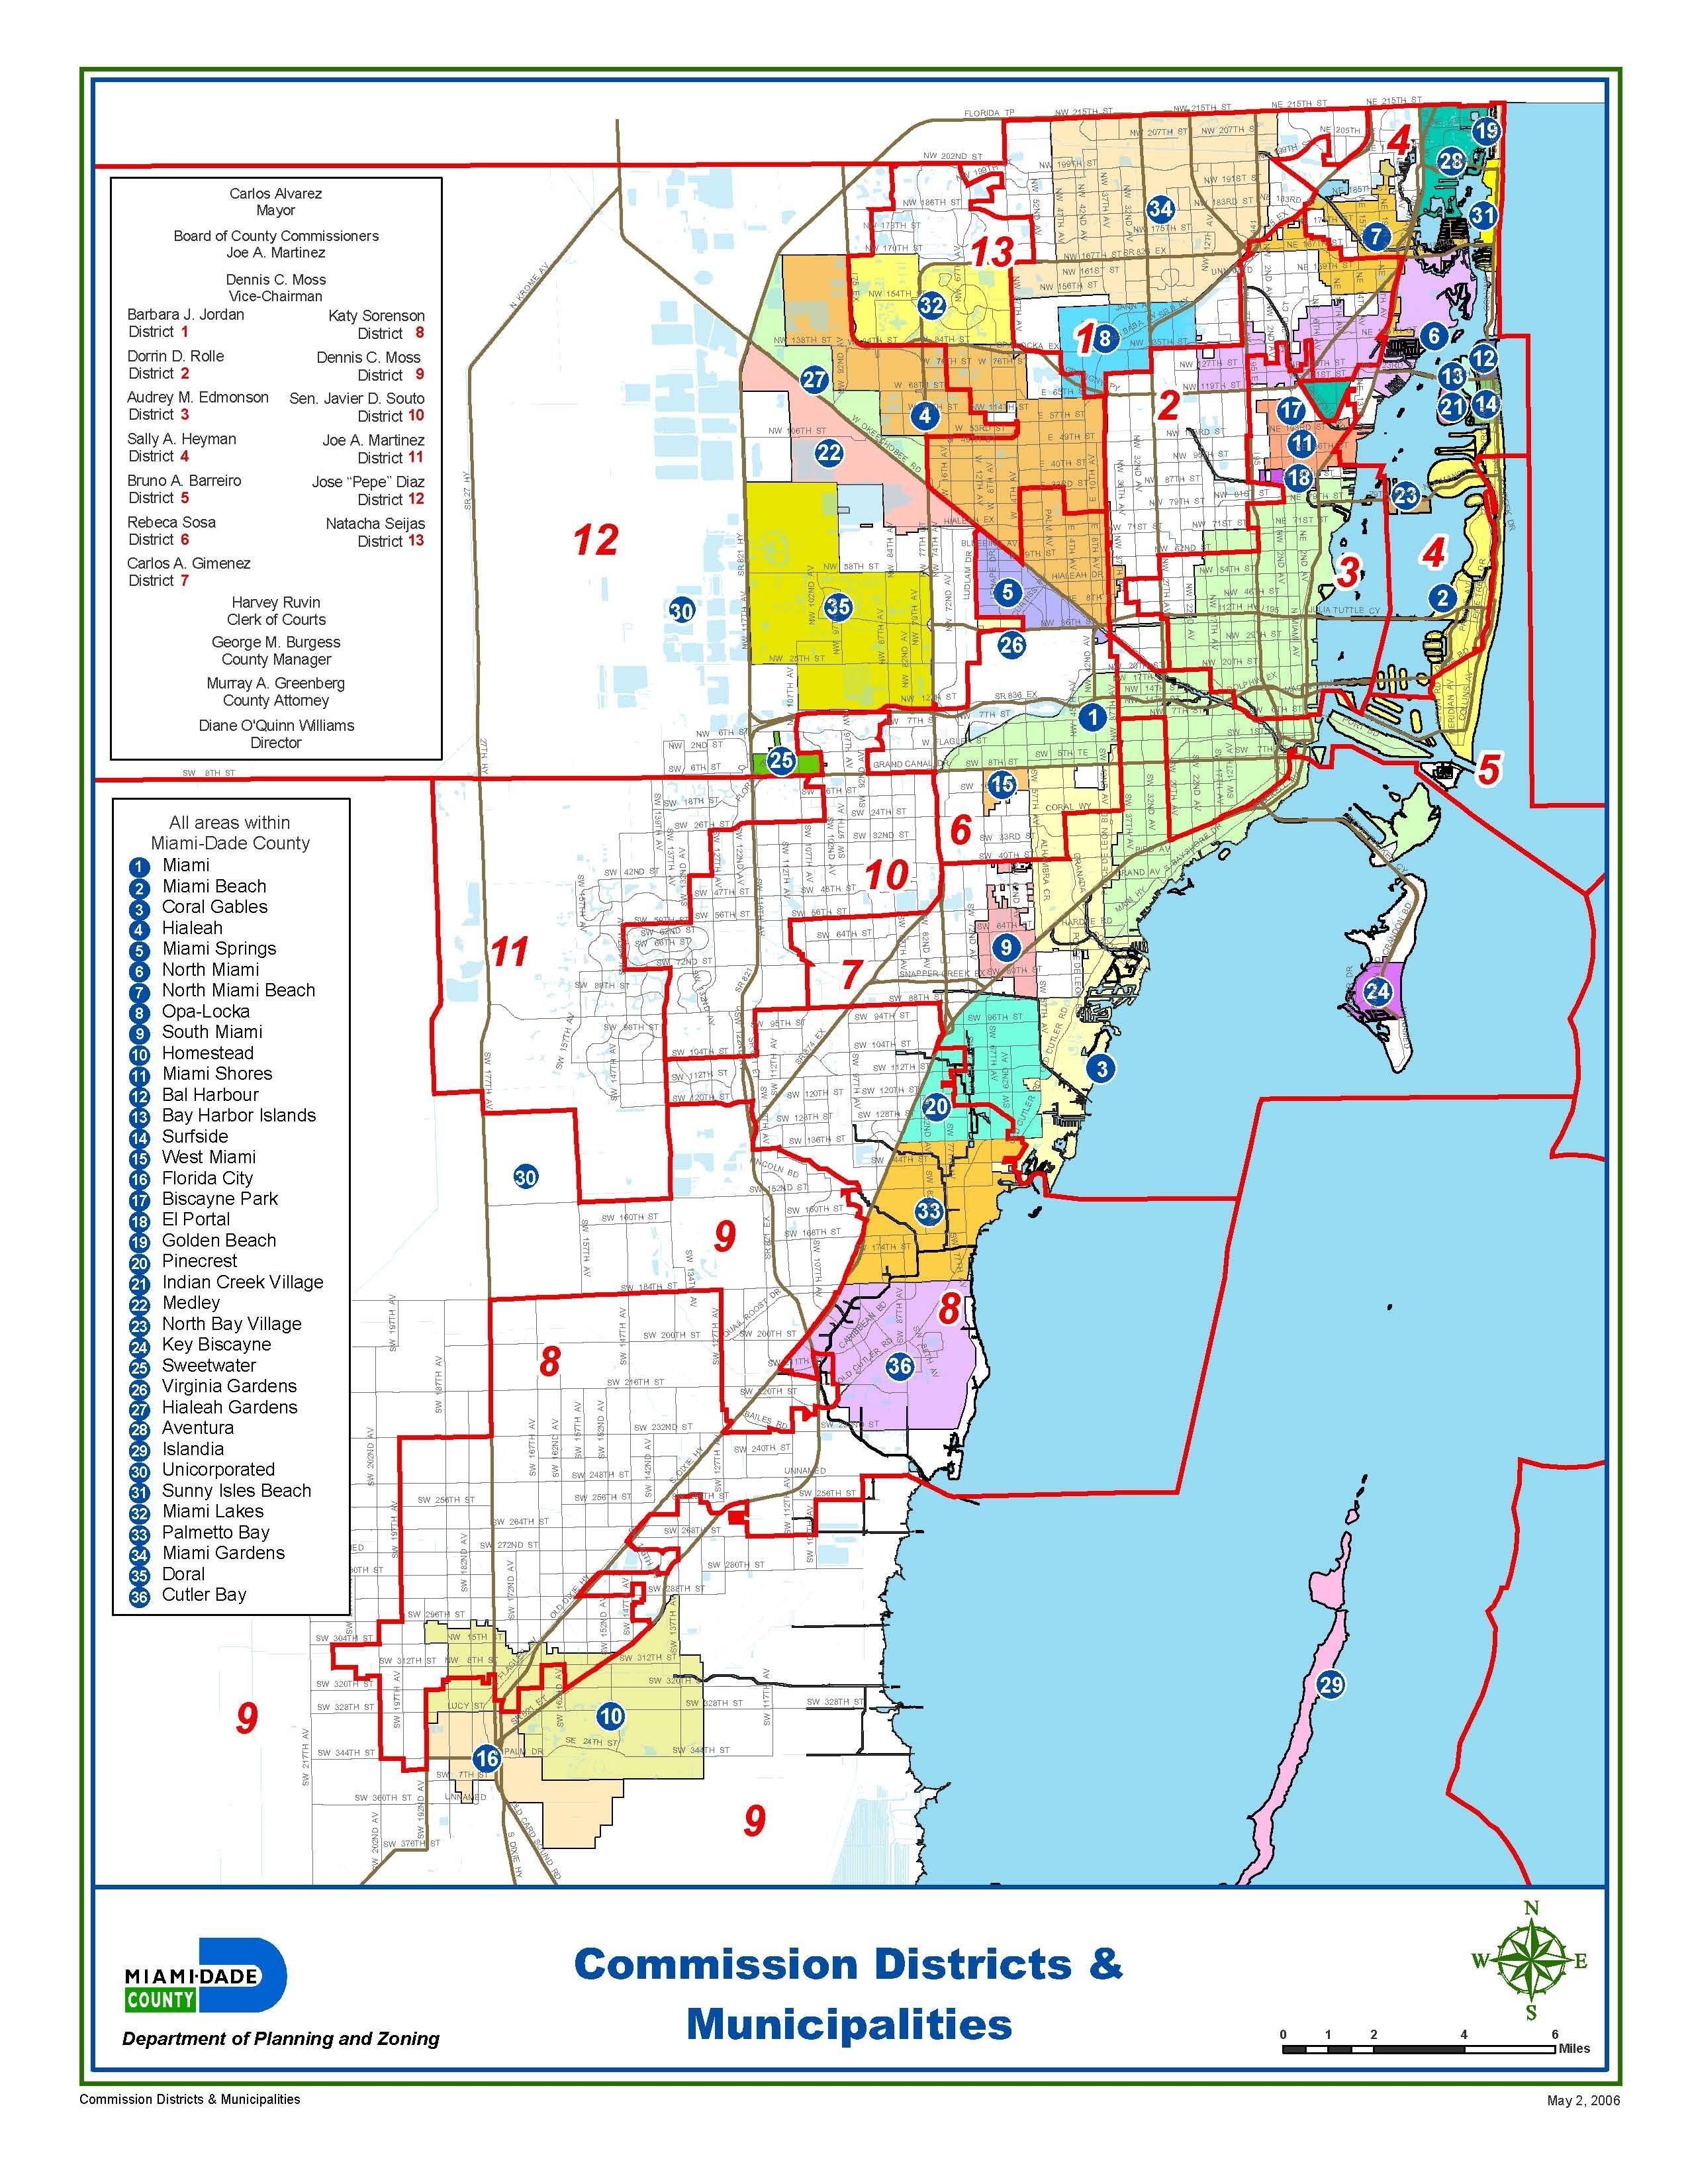 miami-dade municipalities map | map, broward county, miami